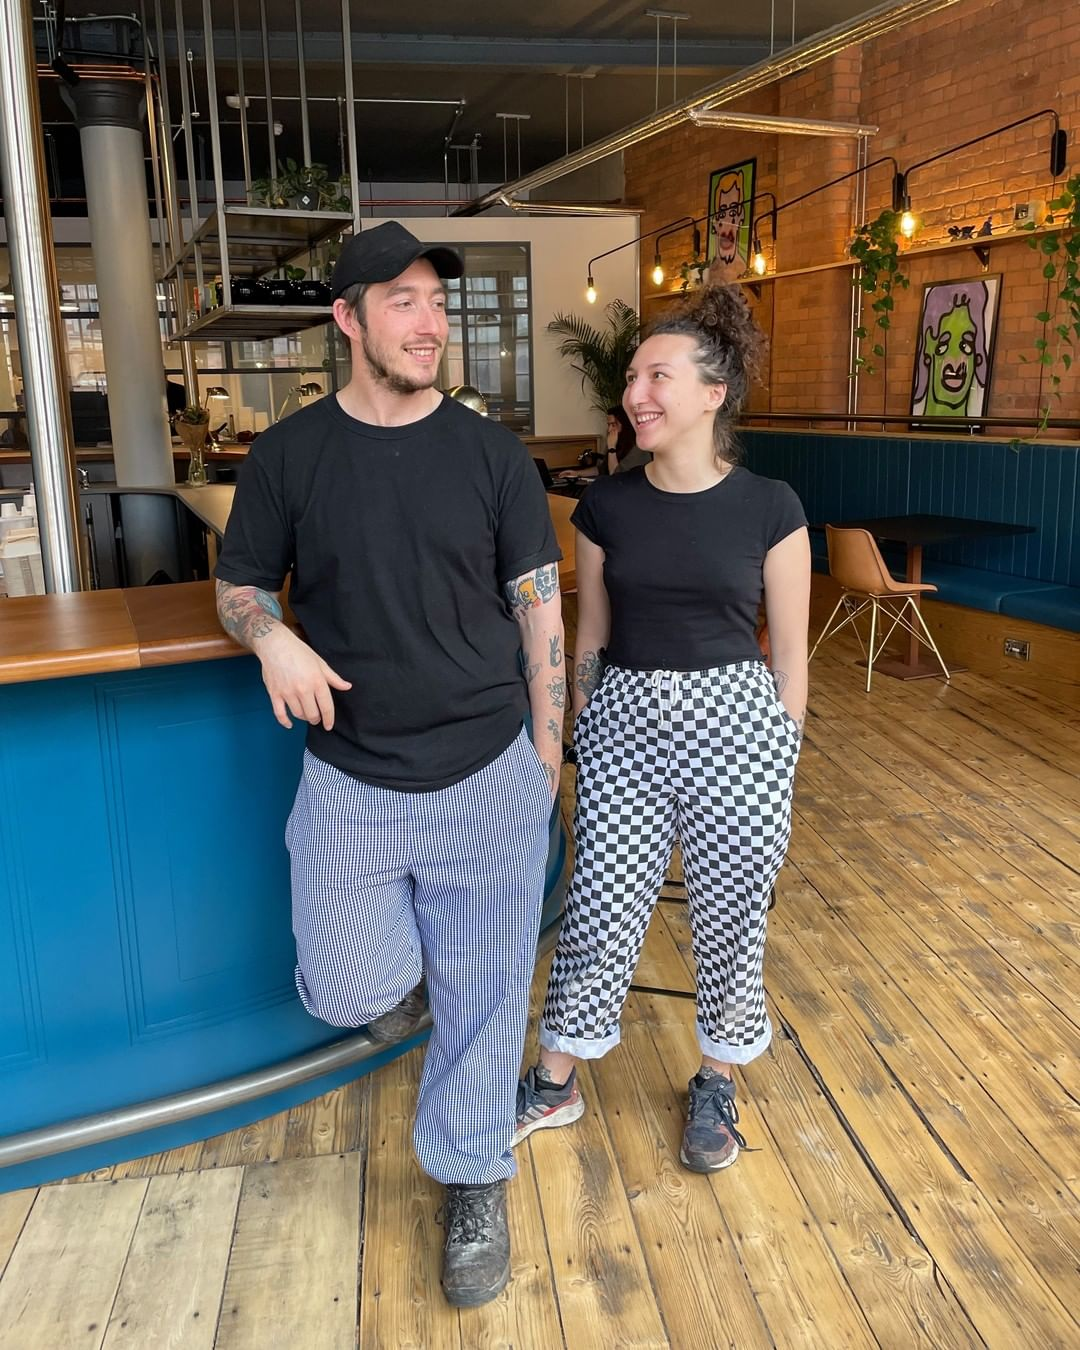 Batard bakery open permanent new cafe at 86 Princess Street, The Manc